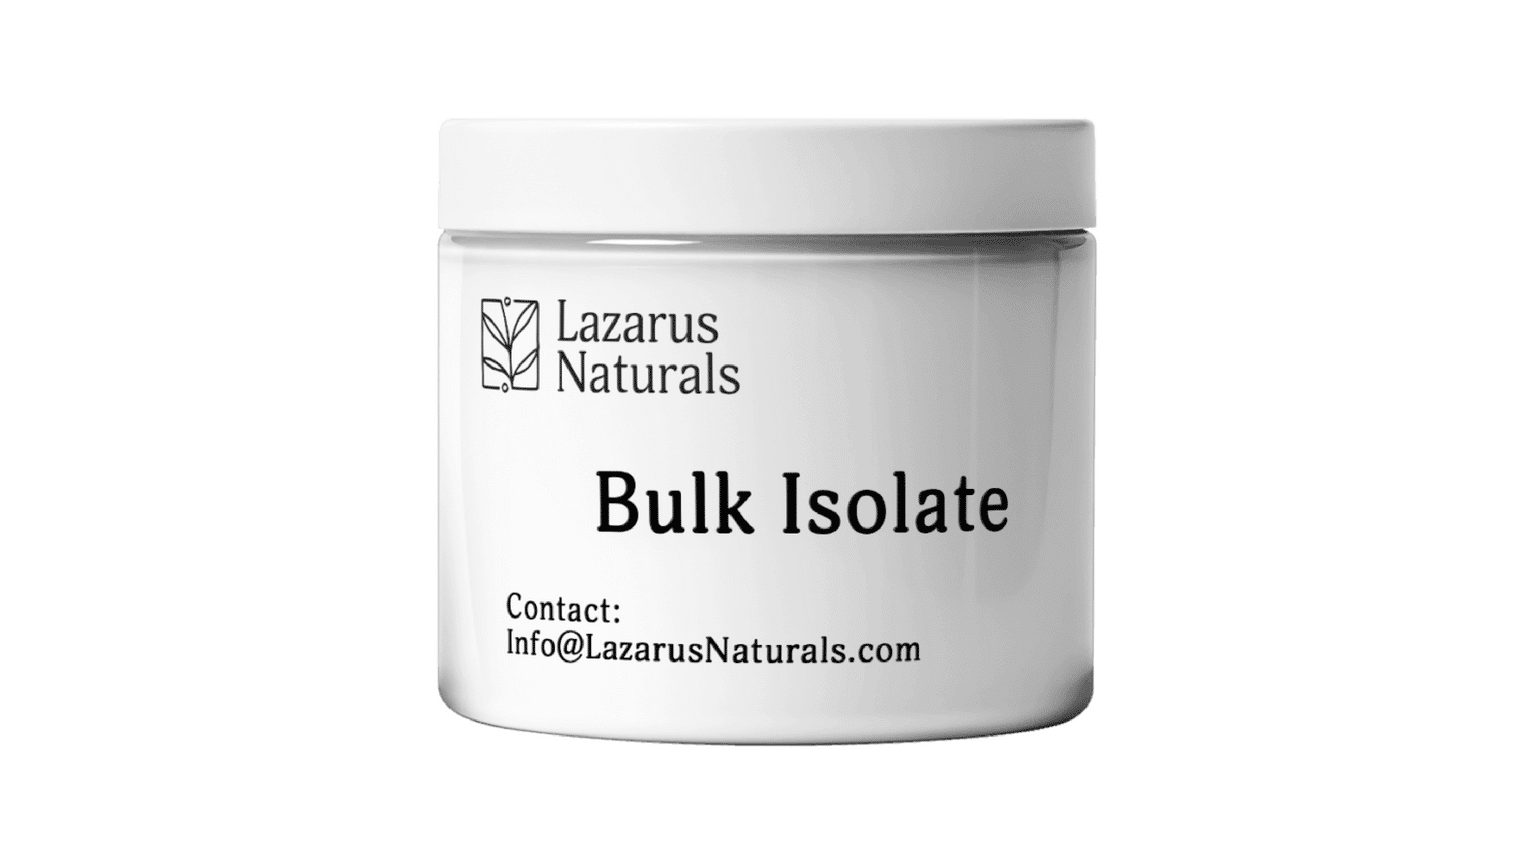 lazarus-naturals-cbd-isolate